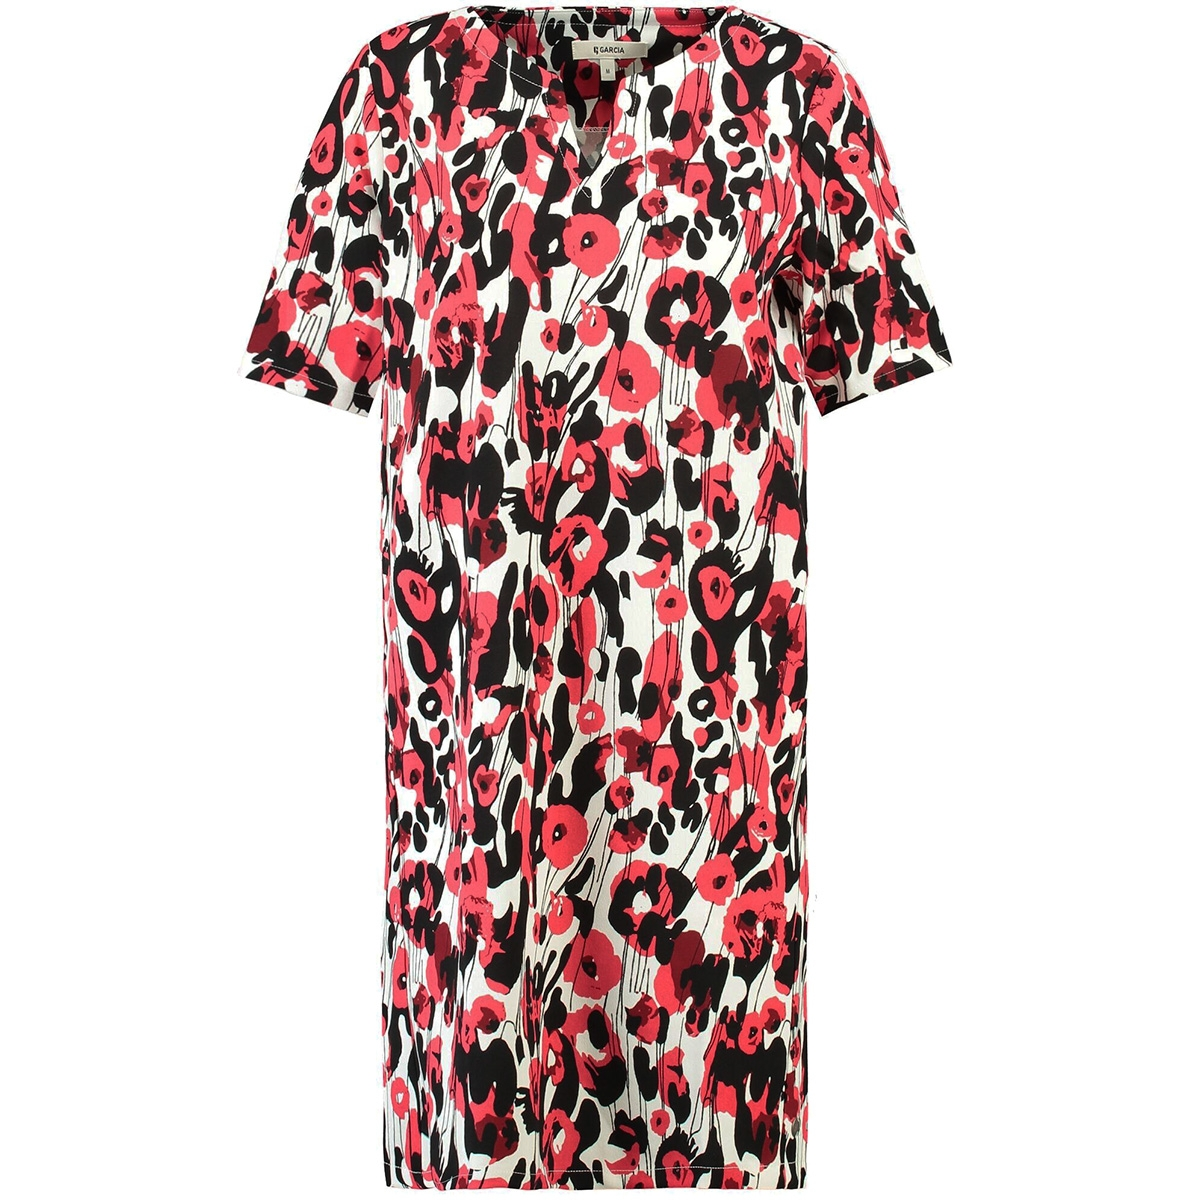 c08c26e28ea827 rode jurk met all over print d90286 garcia jurk 3363 tomato puree